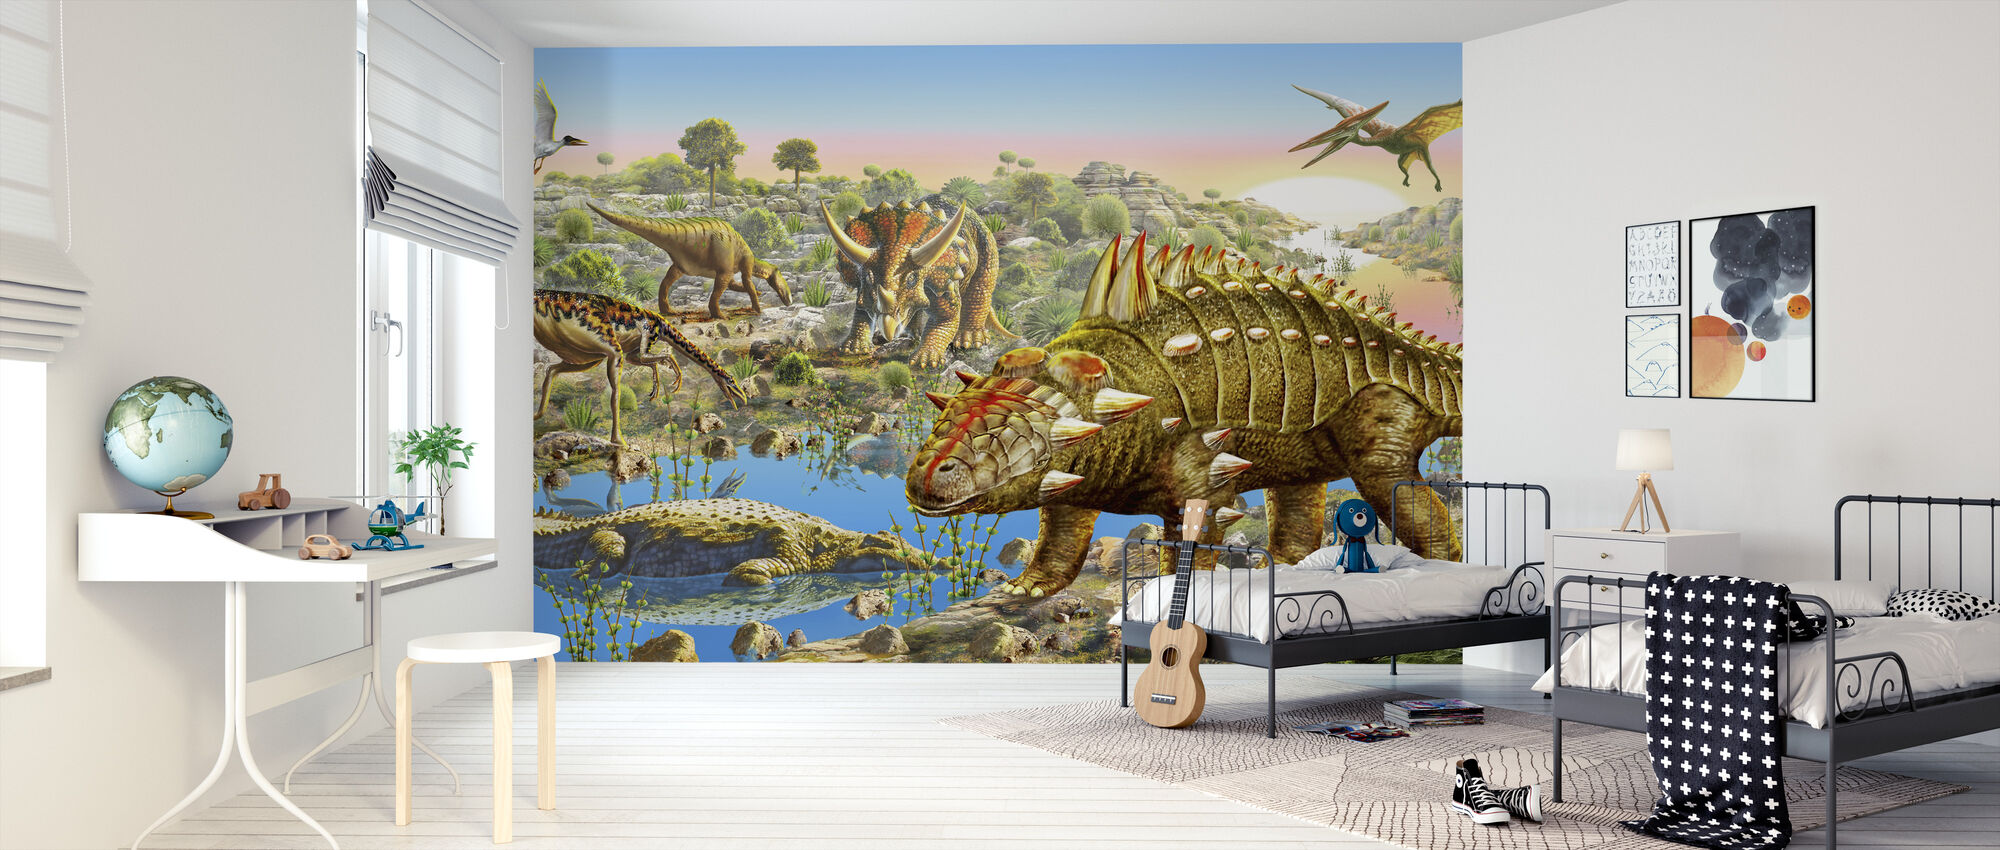 Panorama Dinosaur Valley - Tapet - Børneværelse